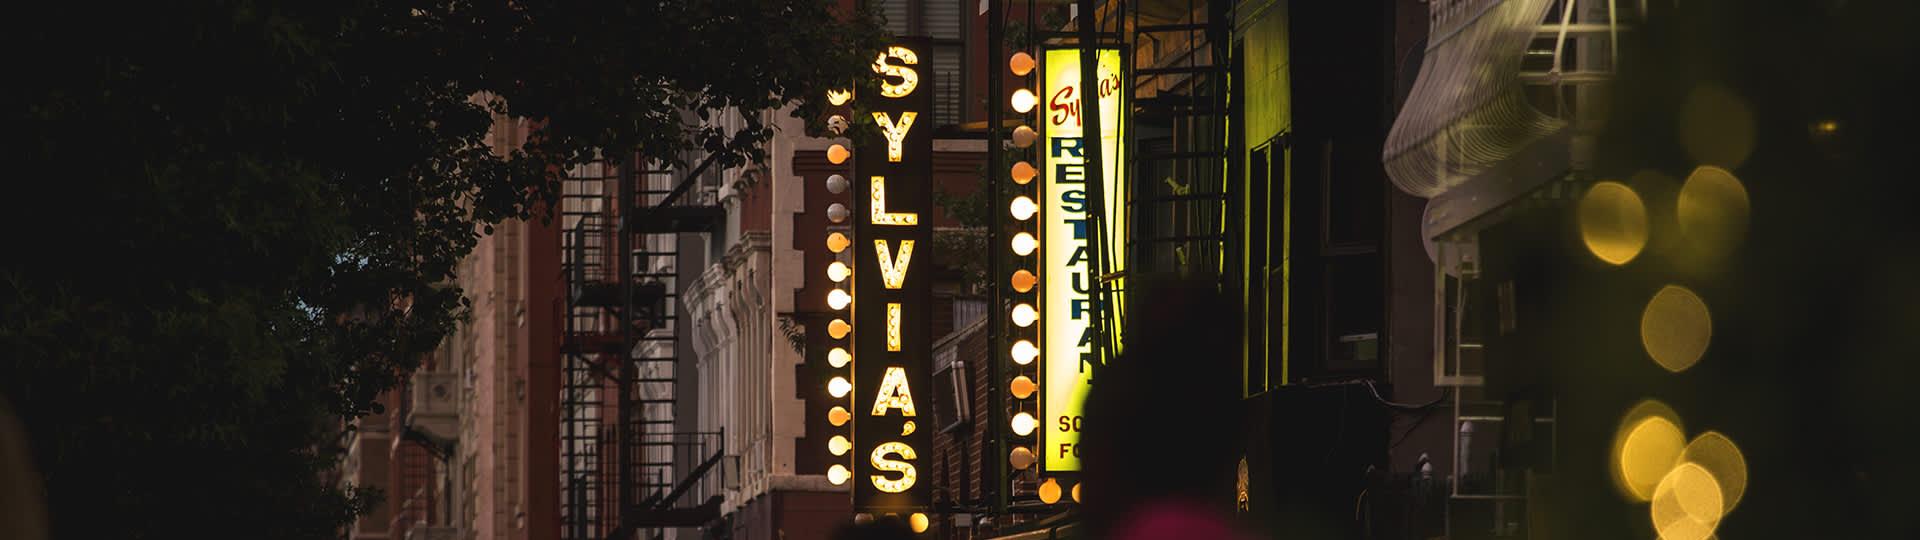 Harlem, NYC, Sylvia's, Restaurants in Harlem, Sylvia's 'Soul Food' Restaurant